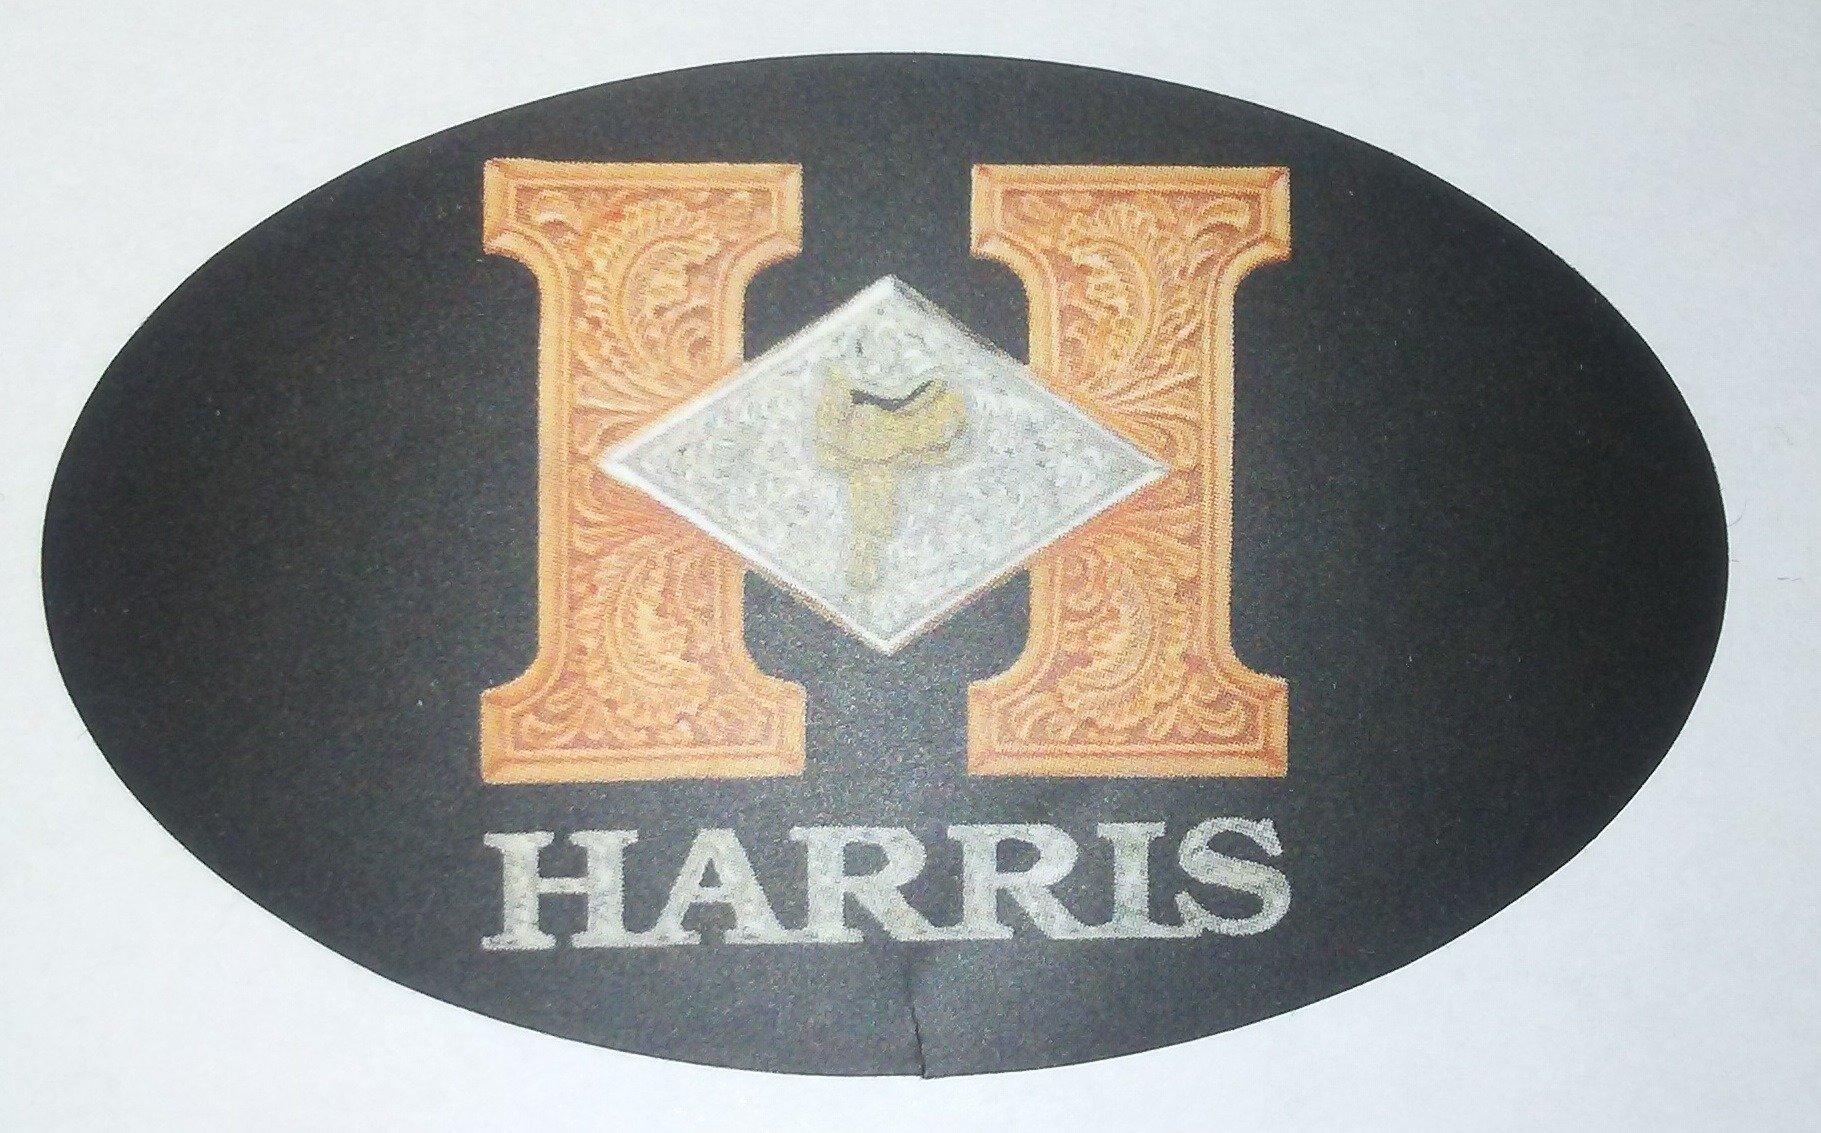 ImPres T&S Label & Sales, LLC image 2